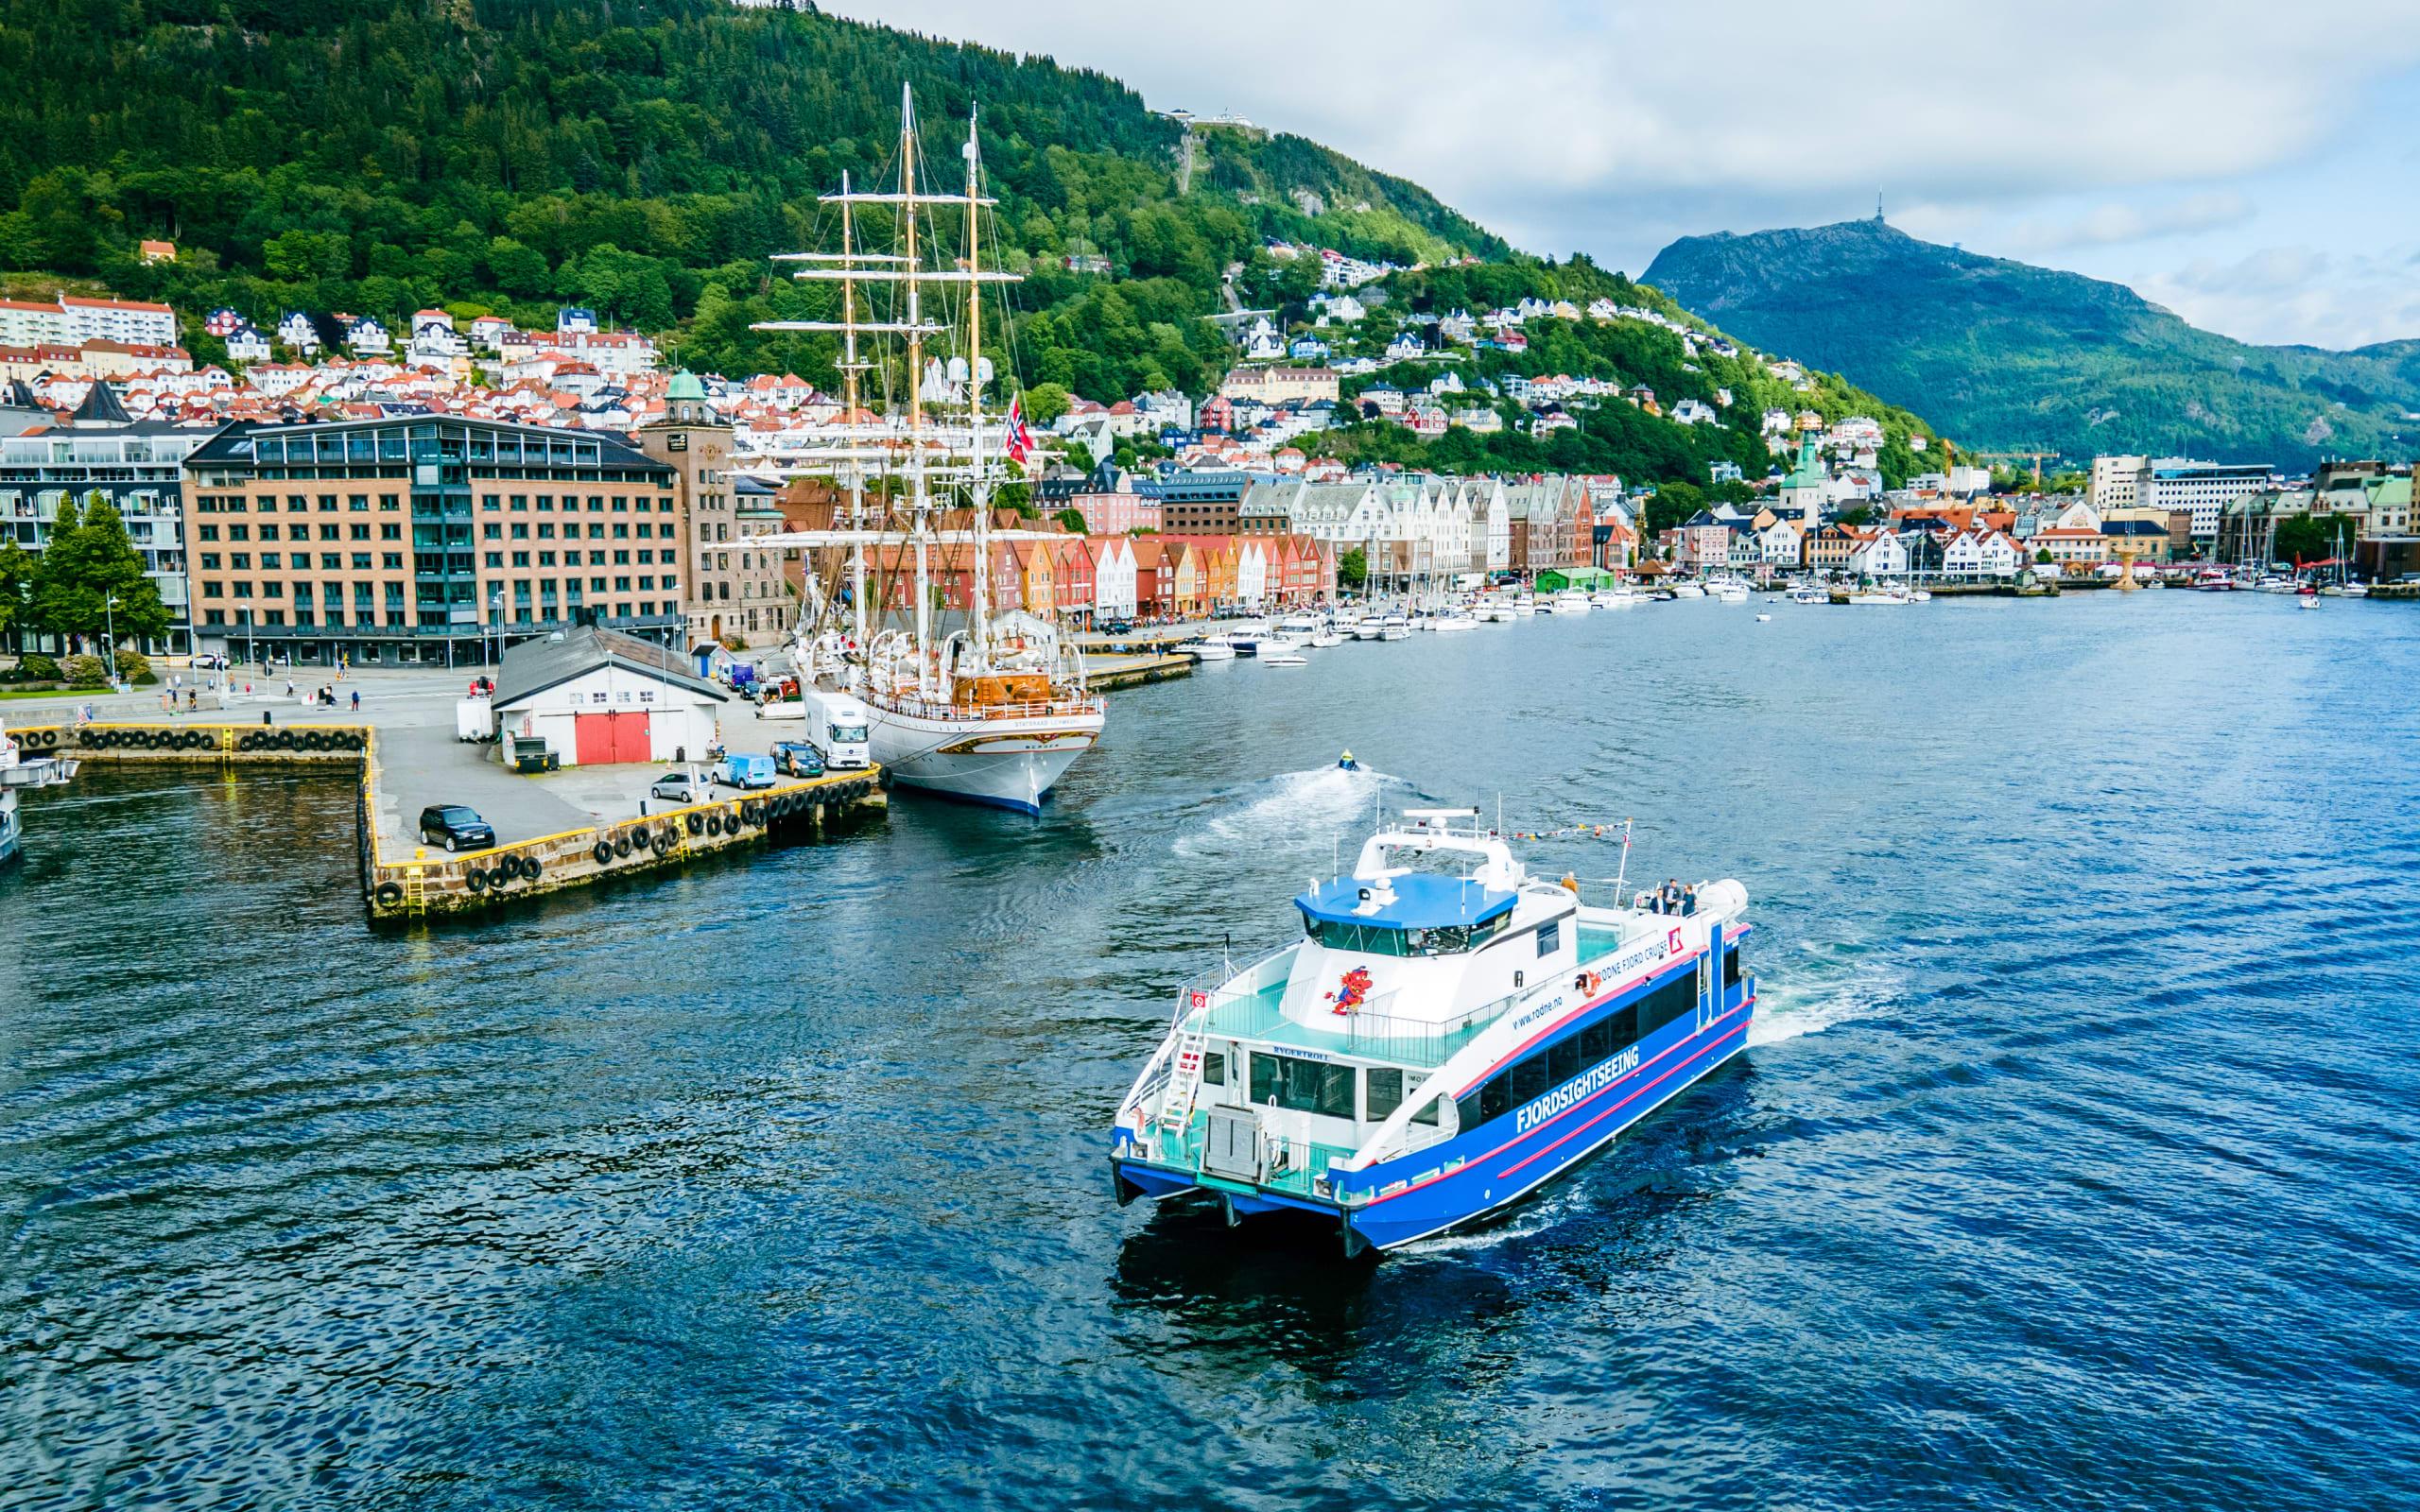 Fjord cruise from Bergen to Bekkjarvik